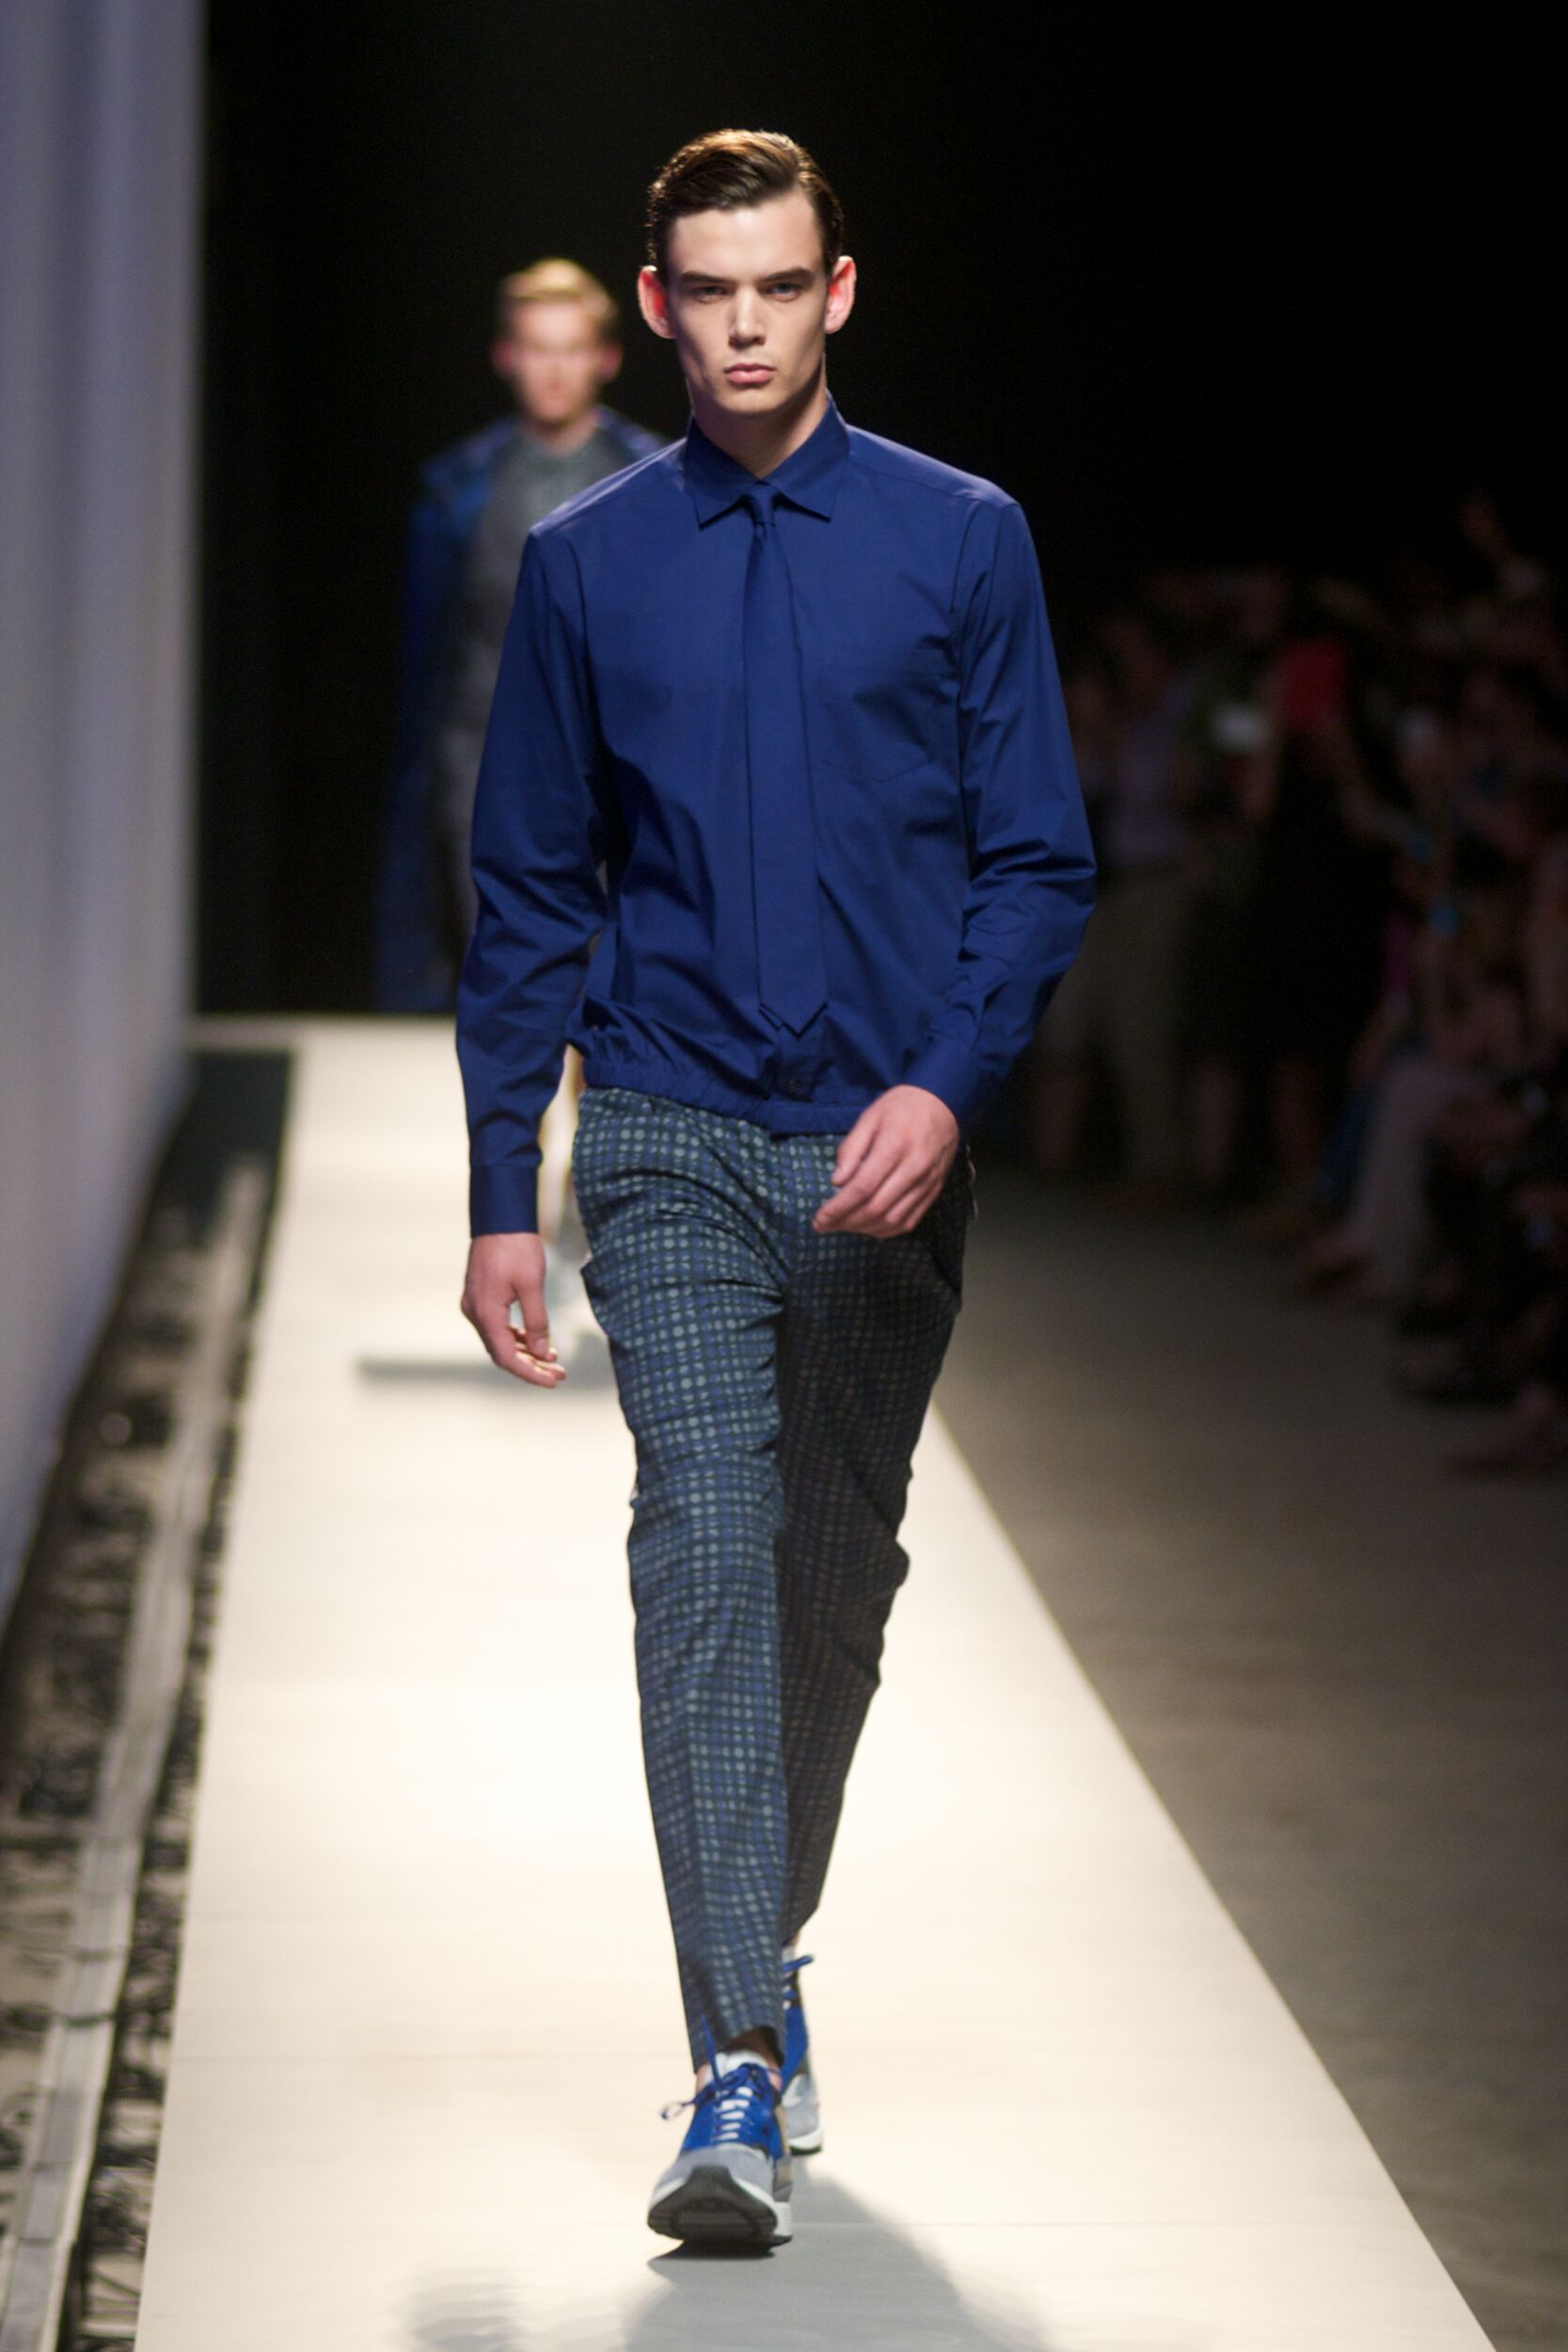 Spring 2015 Man Fashion Show Z Zegna